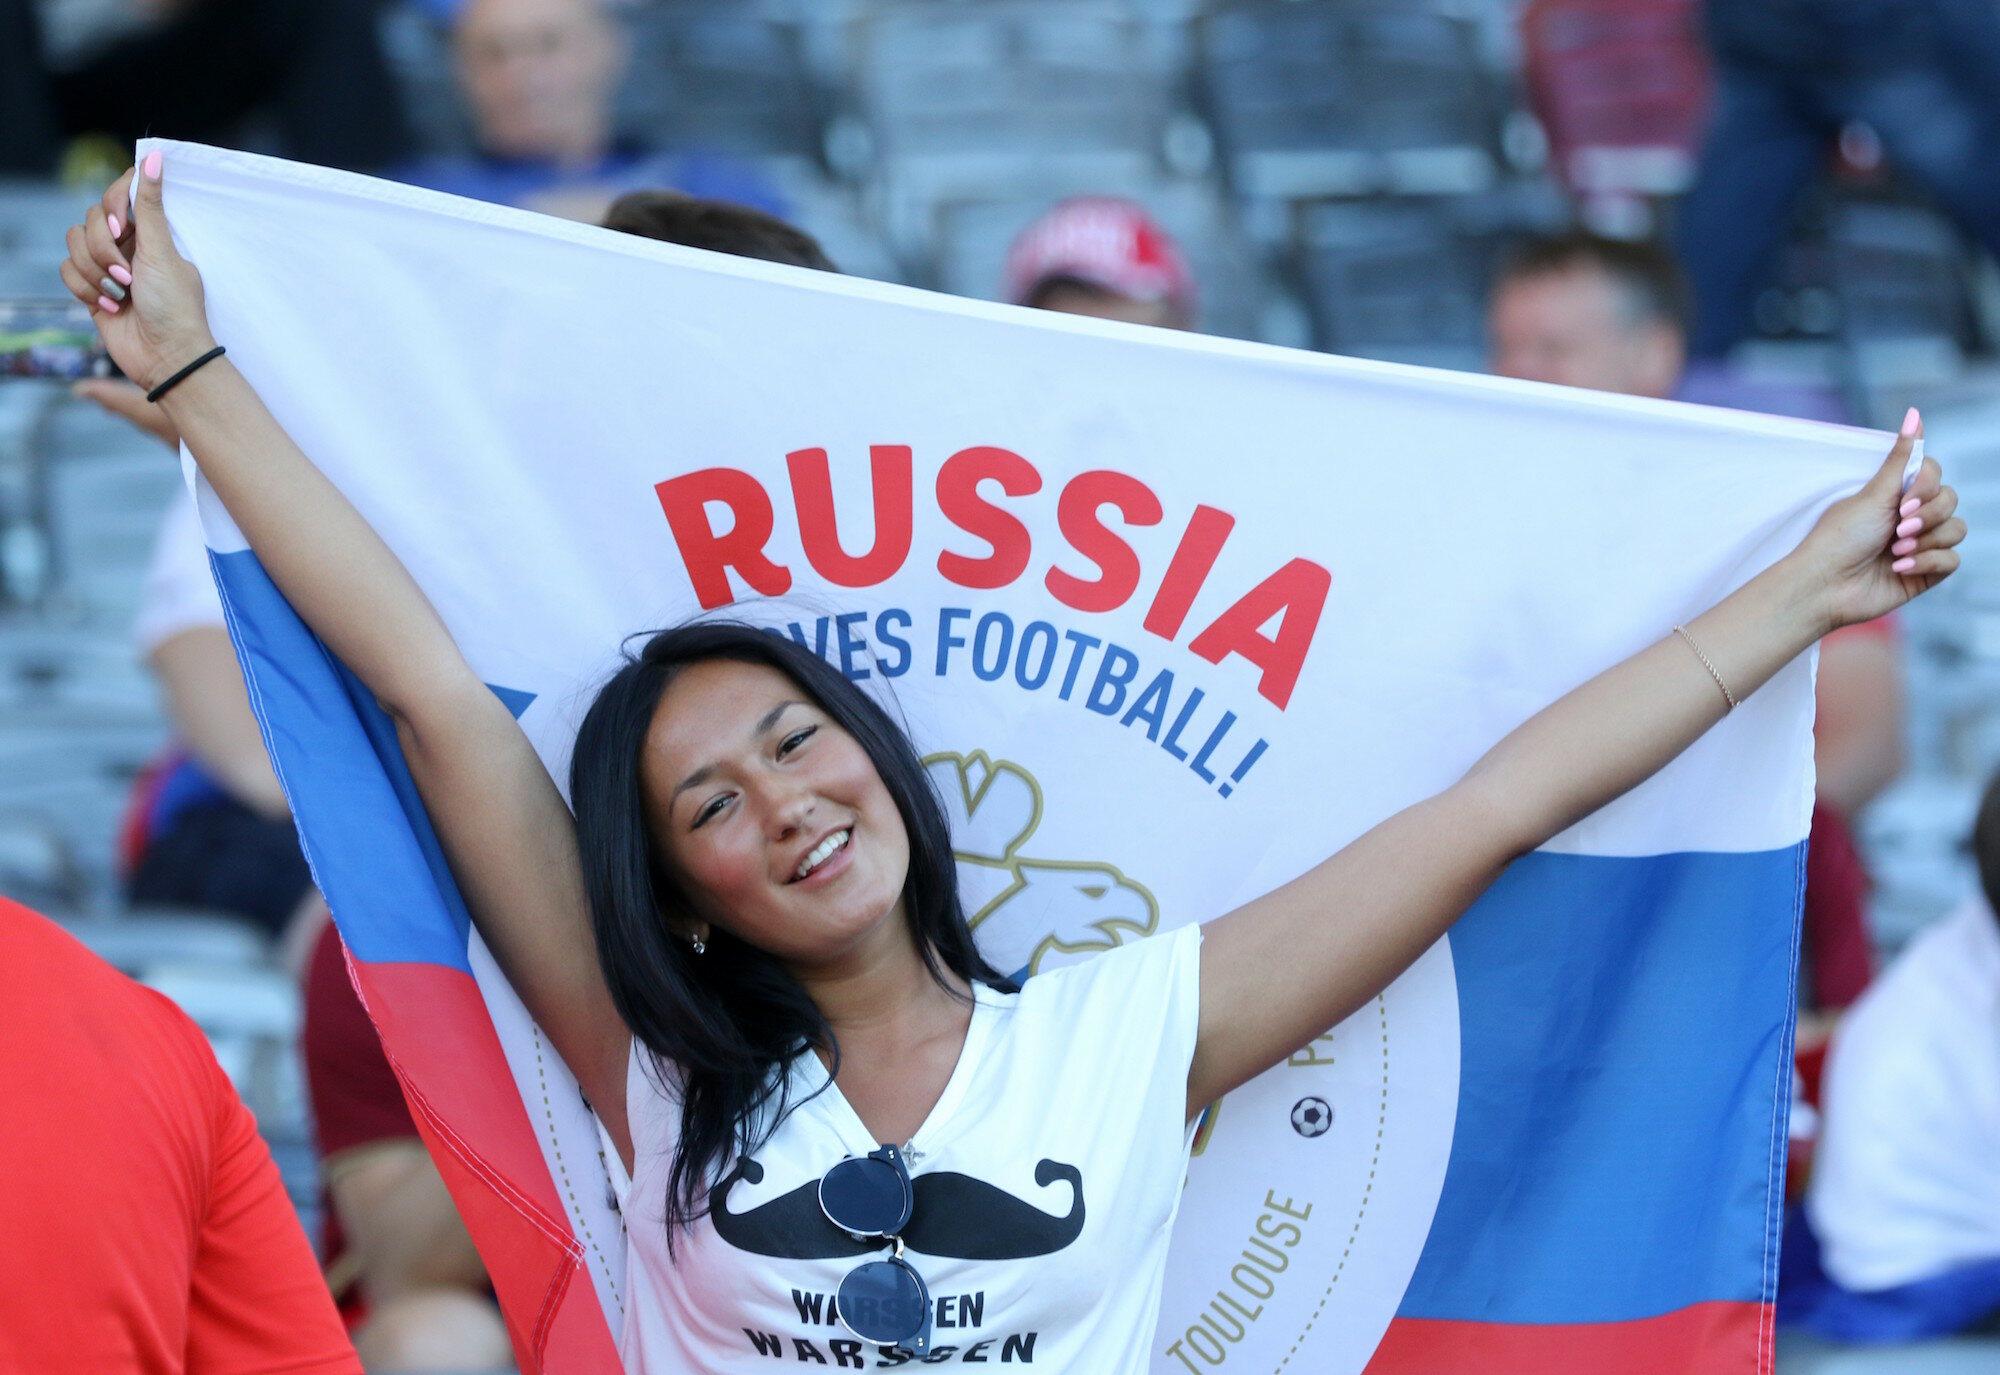 Fanka reprezentacji Rosji